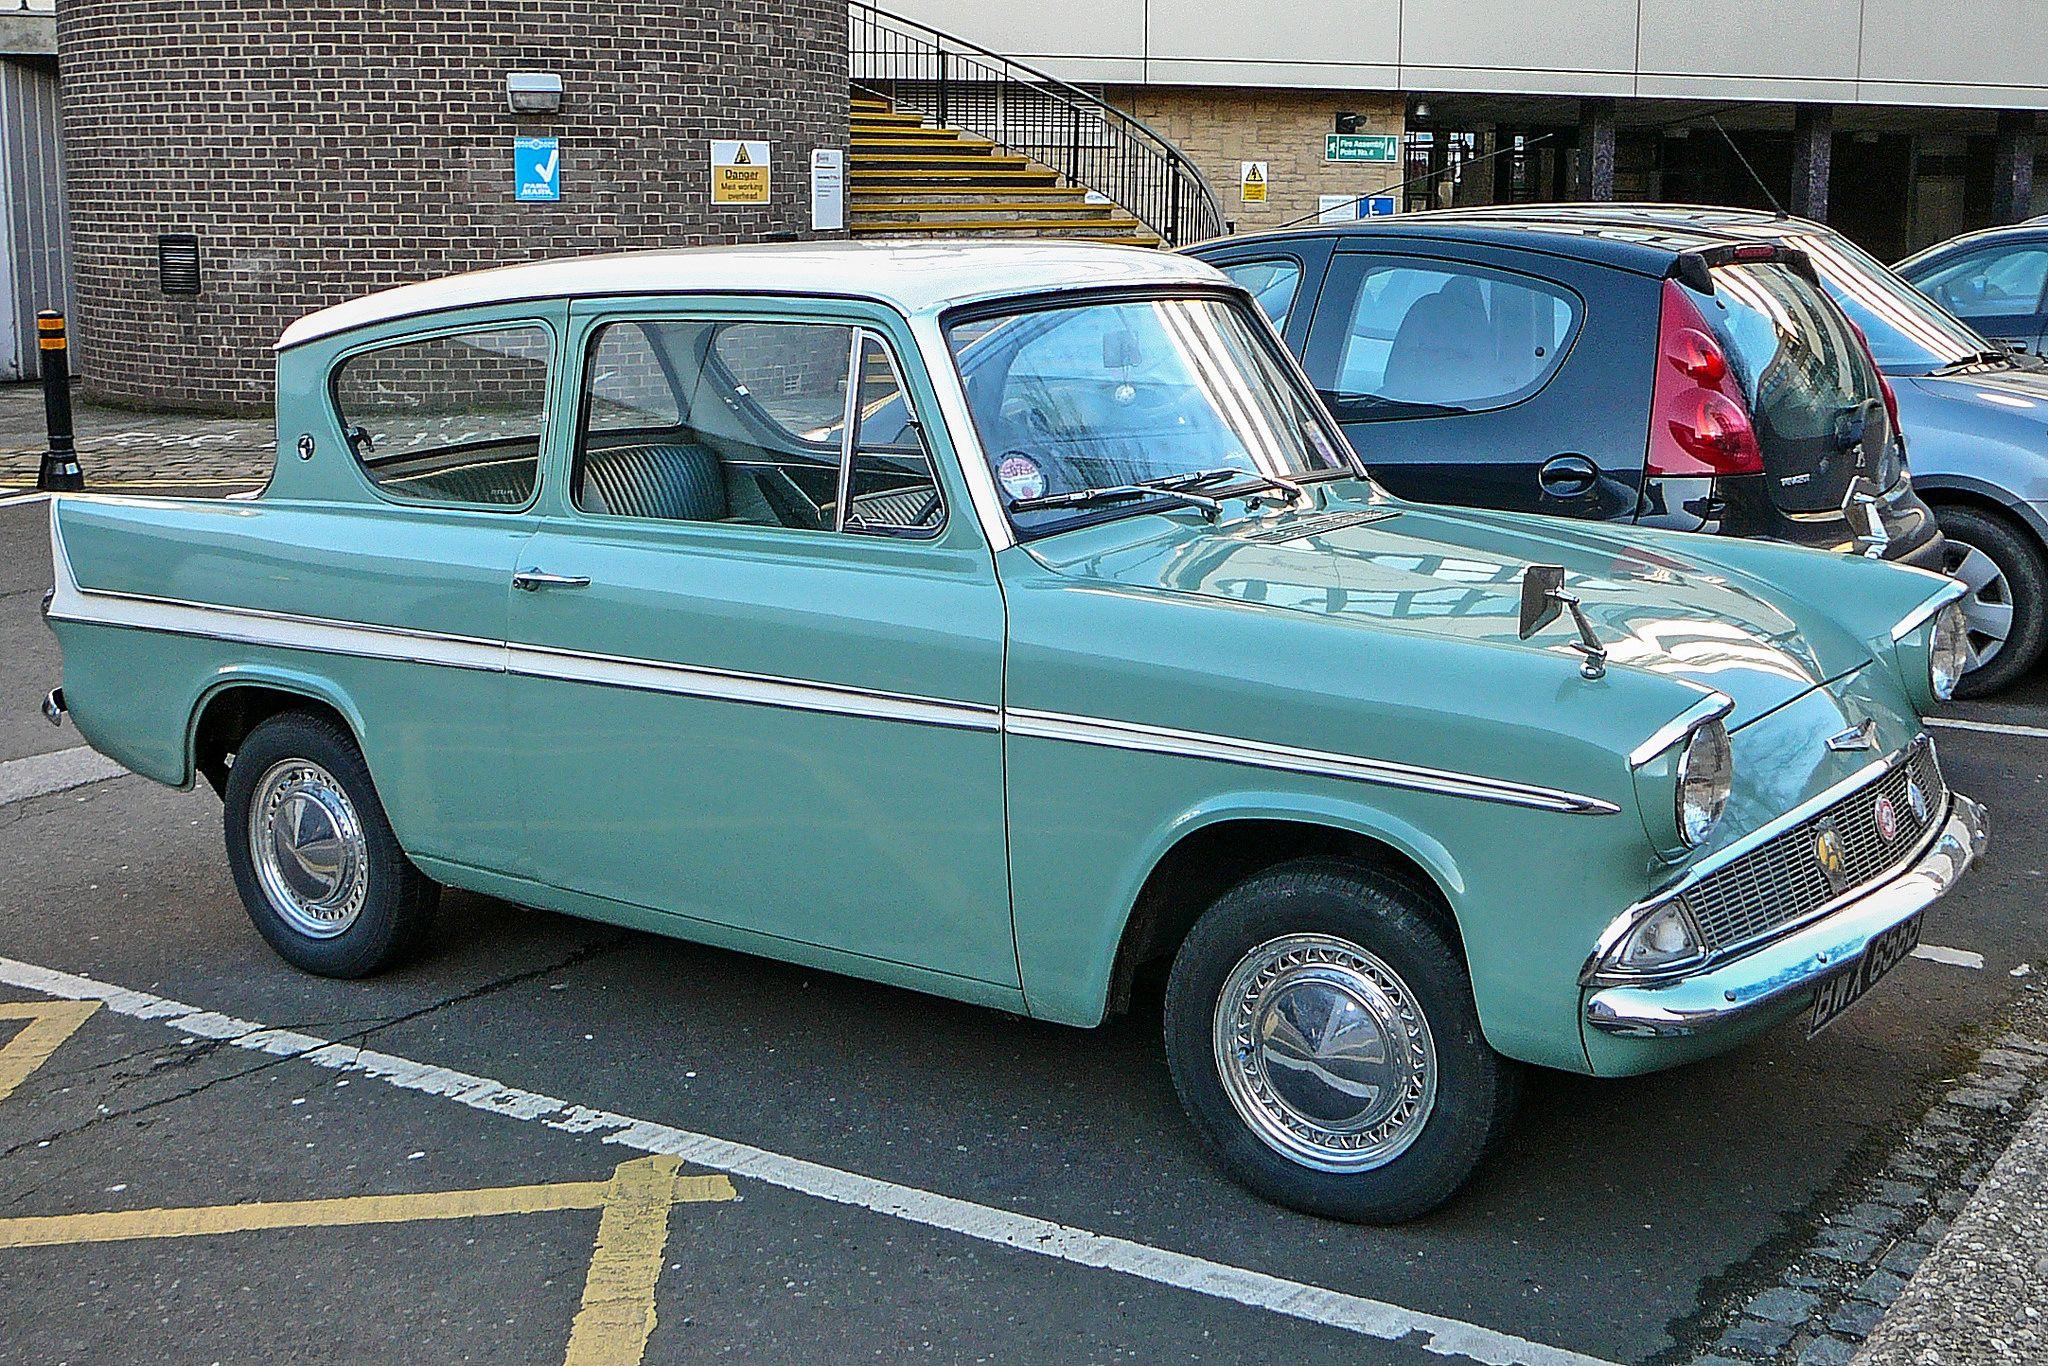 1964 Ford Anglia Ford Anglia British Cars 1964 Ford